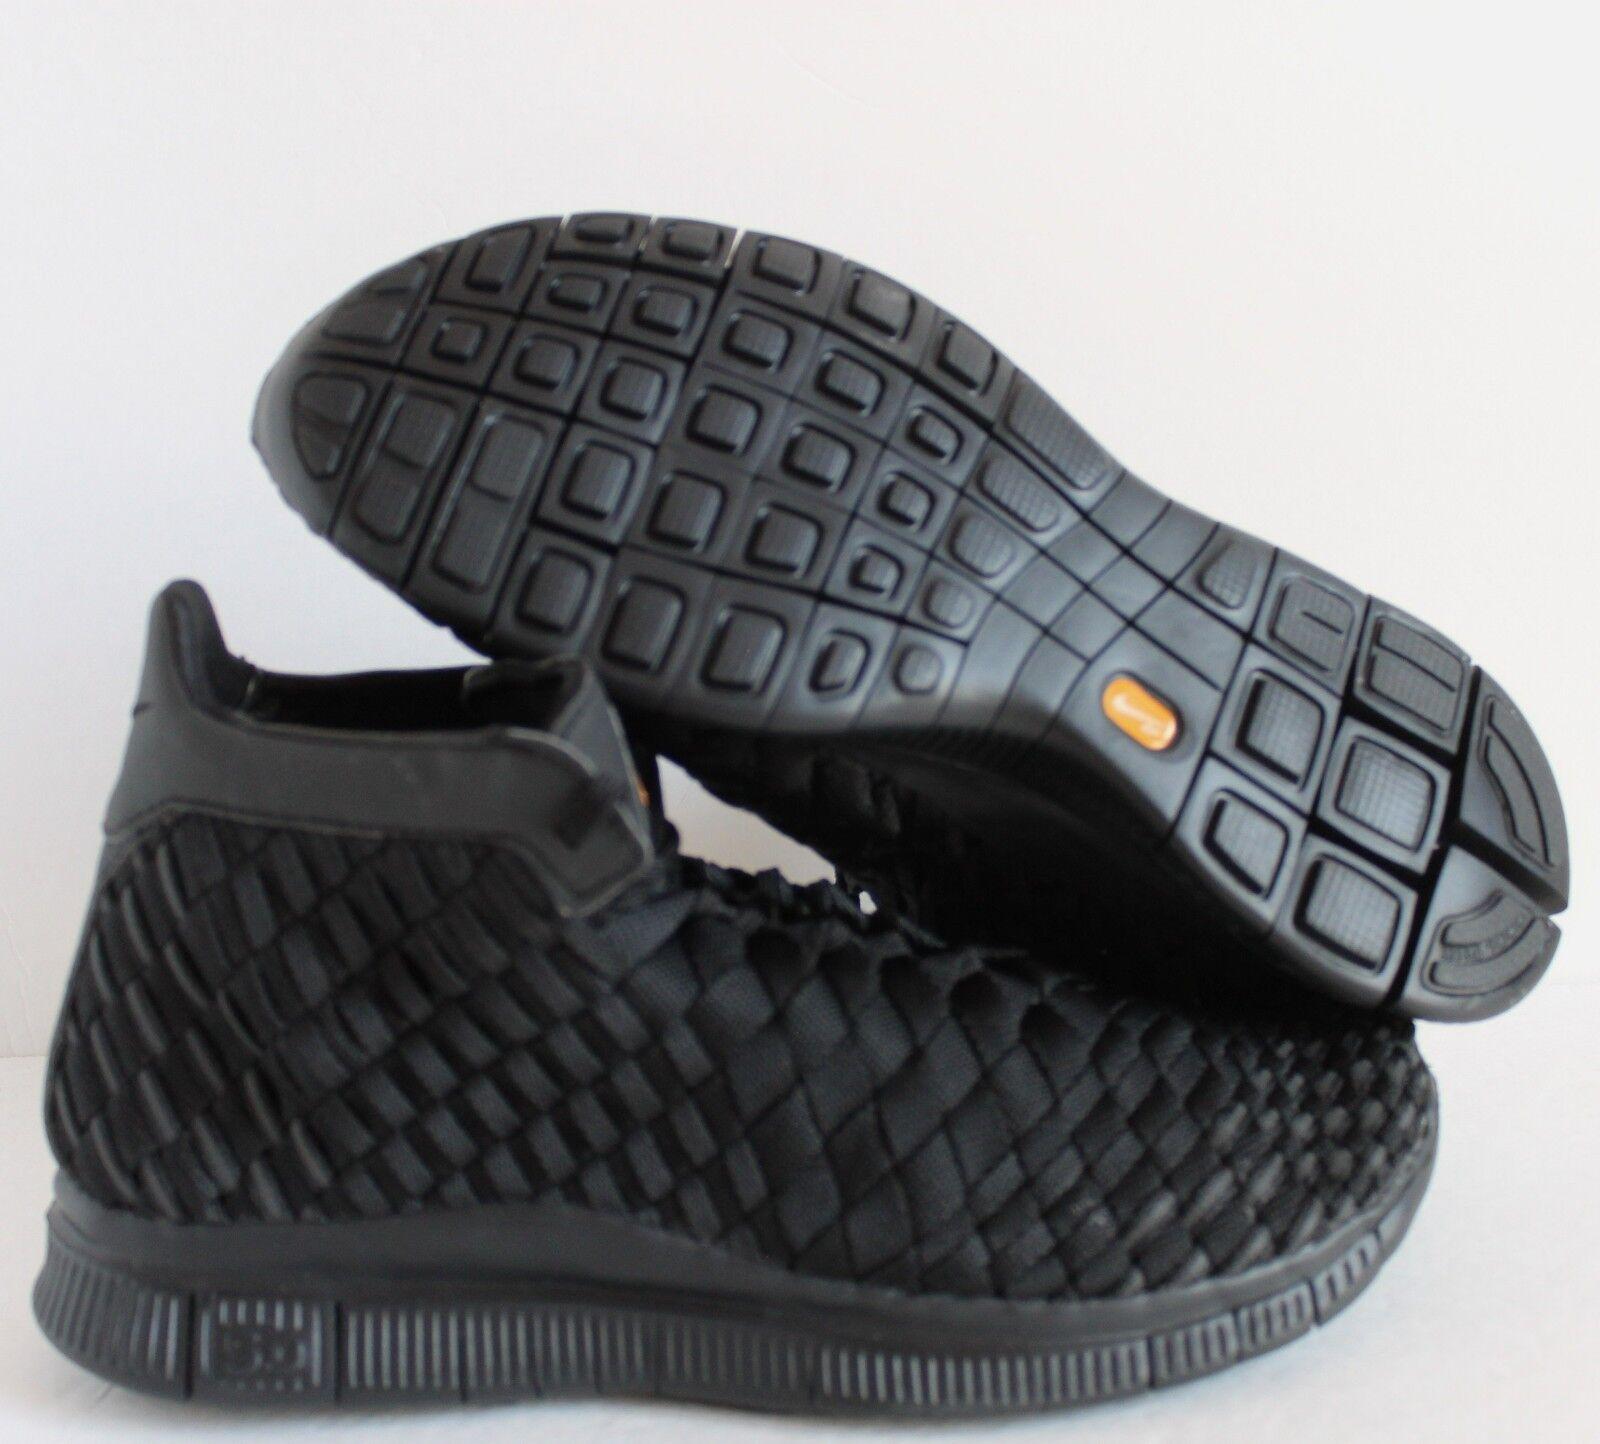 new styles 1be3d 0a80e NIKE FREE FREE FREE INNEVA WOVEN WVN MID SP ALL BLACK SZ 8  800907-